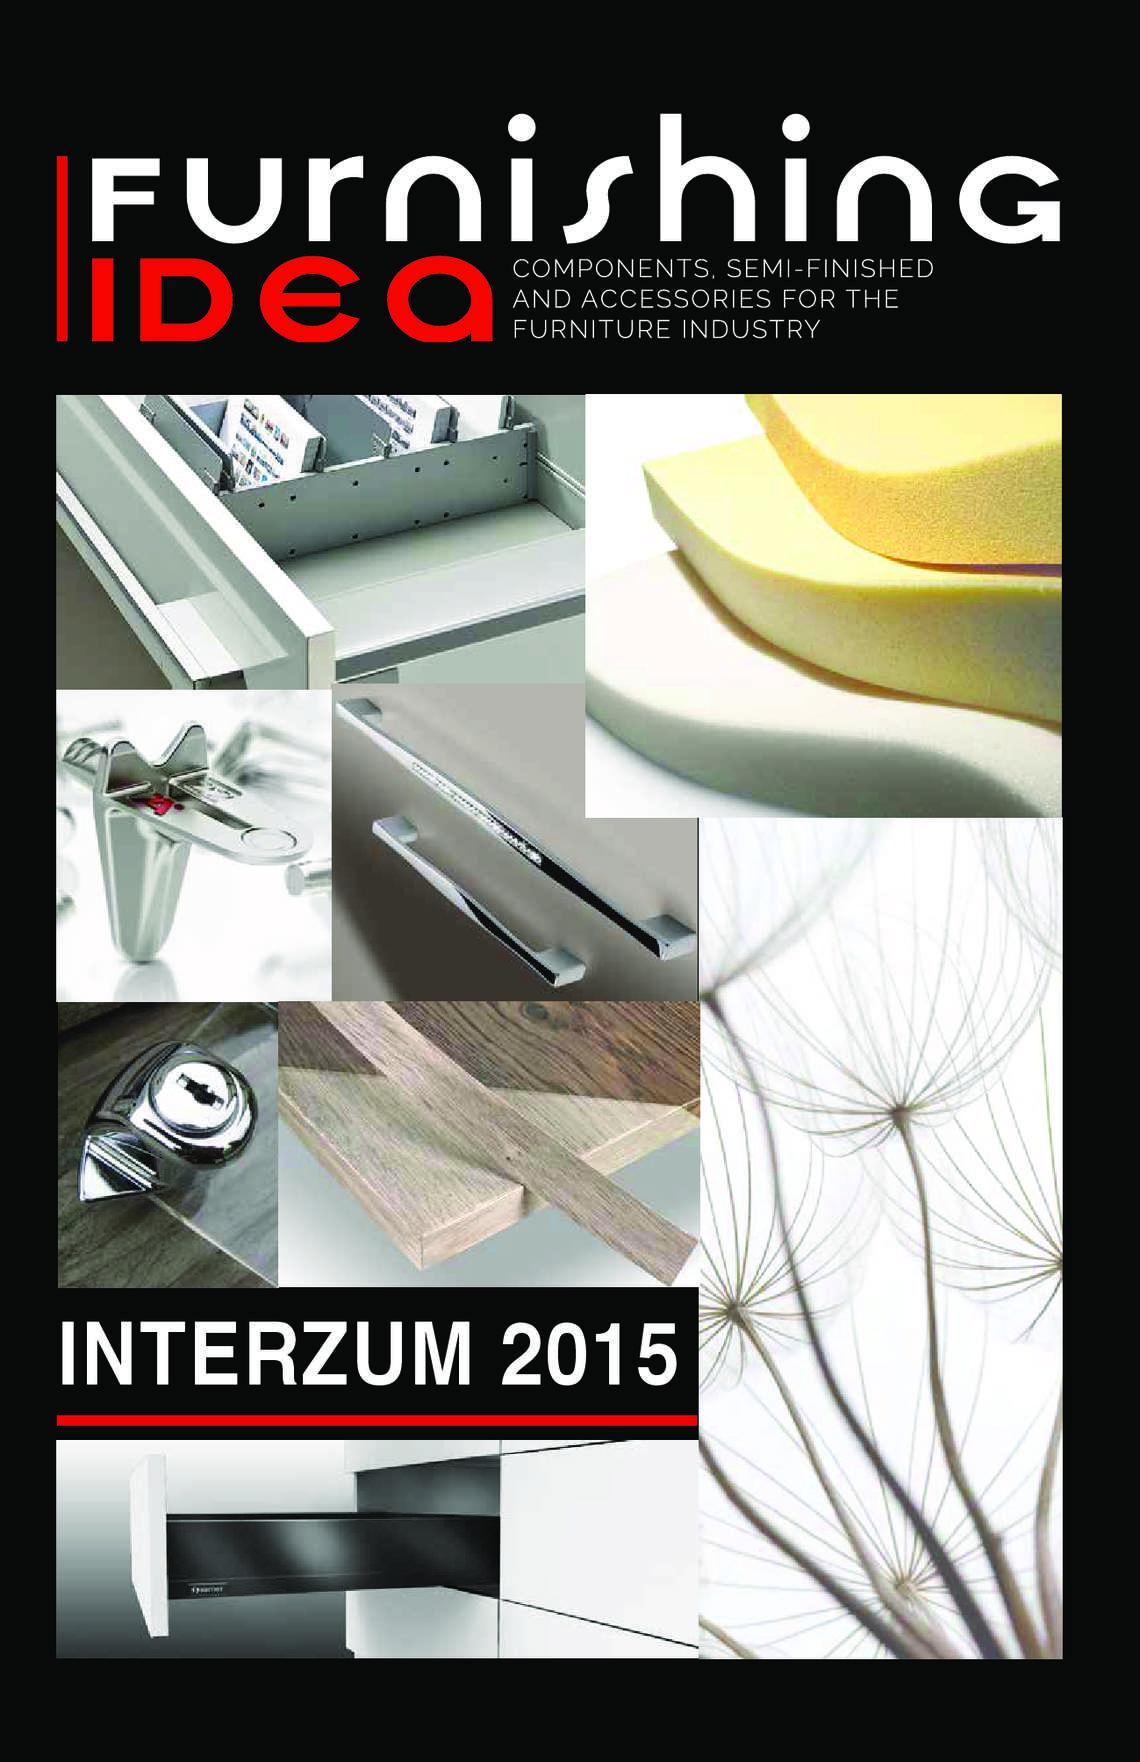 interzum-2015_journal_0_000.jpg